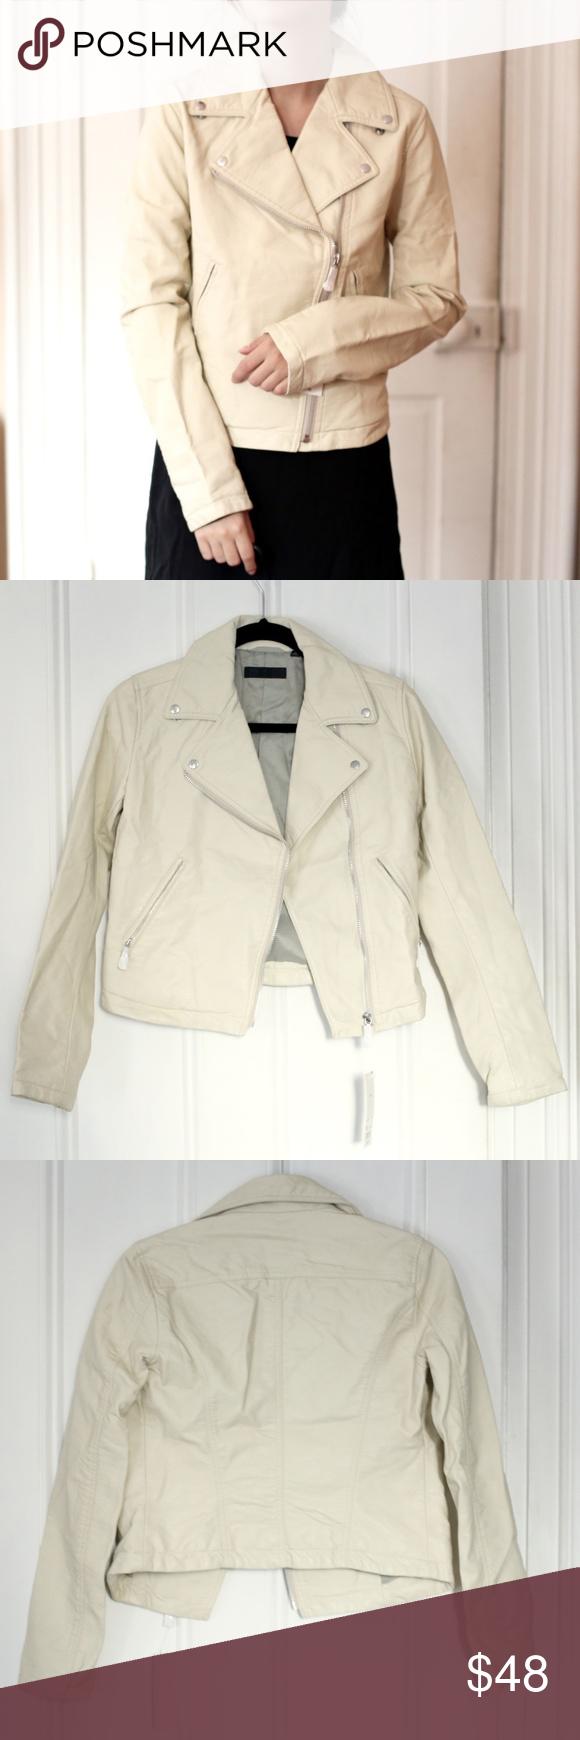 Uniqlo OffWhite Cream Faux Vegan Leather Jacket NWT